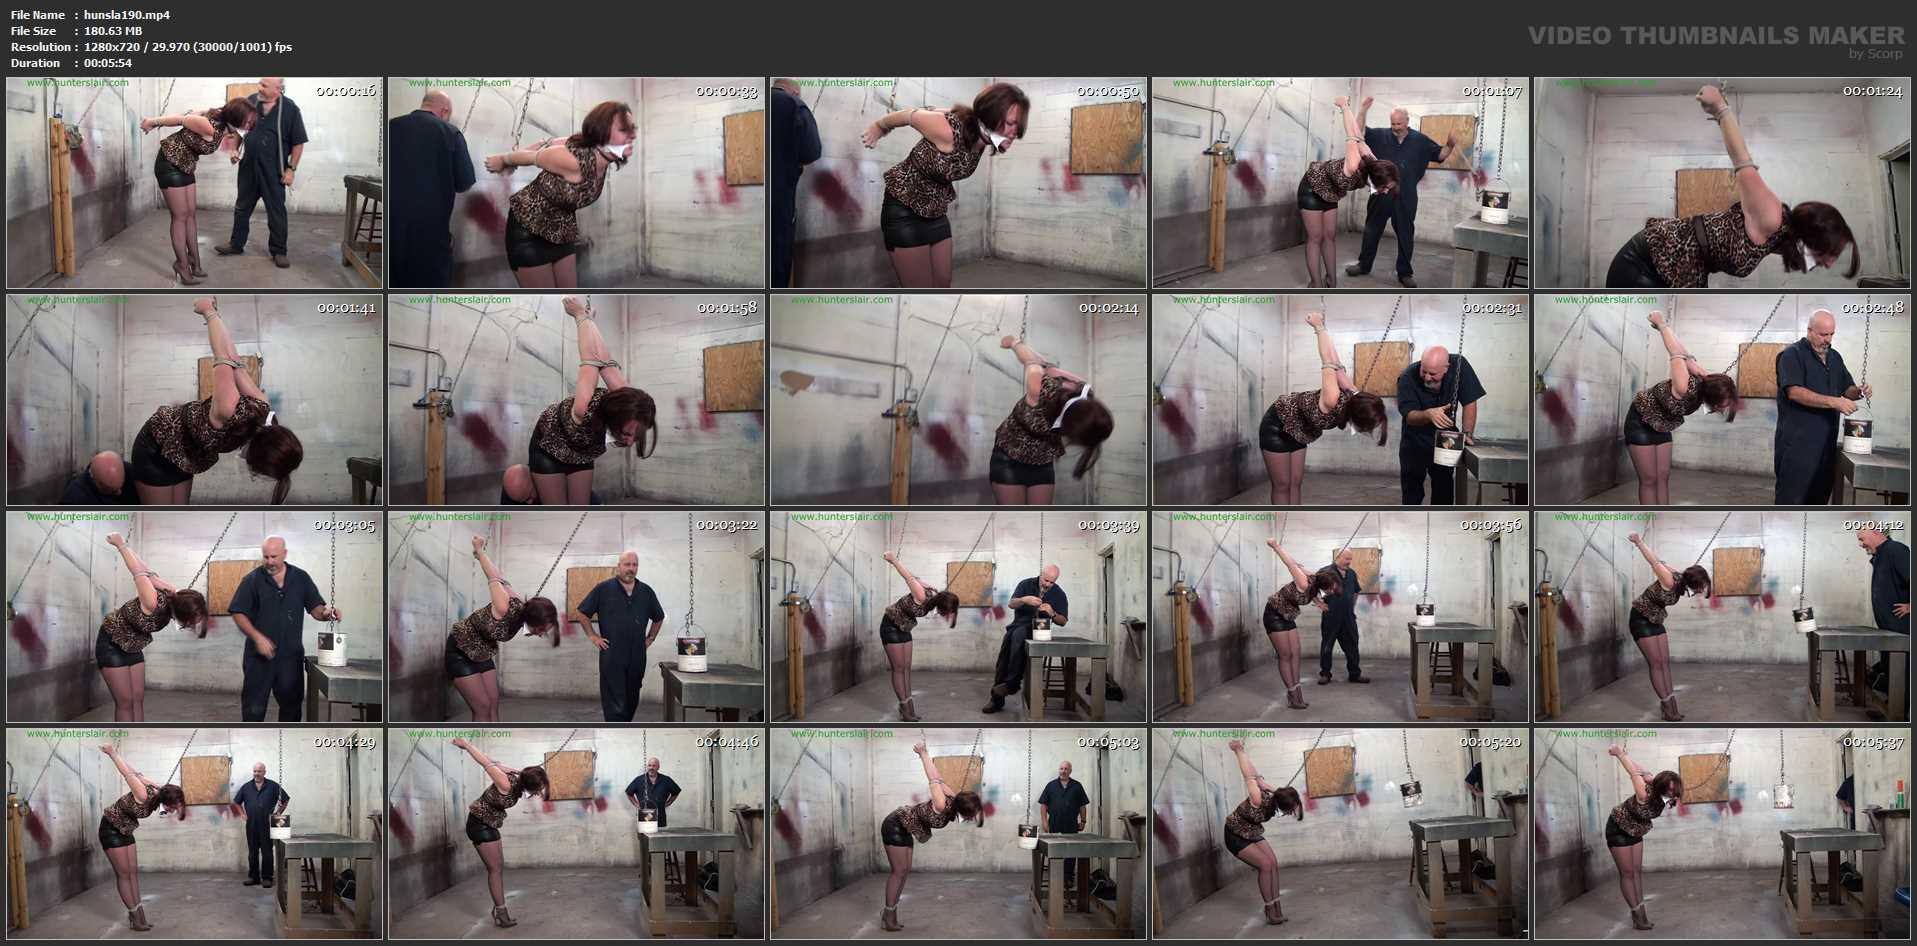 [HUNTERSLAIR] Strappado neck stretch peril. Featuring: Launa Lane [HD][720p][MP4]